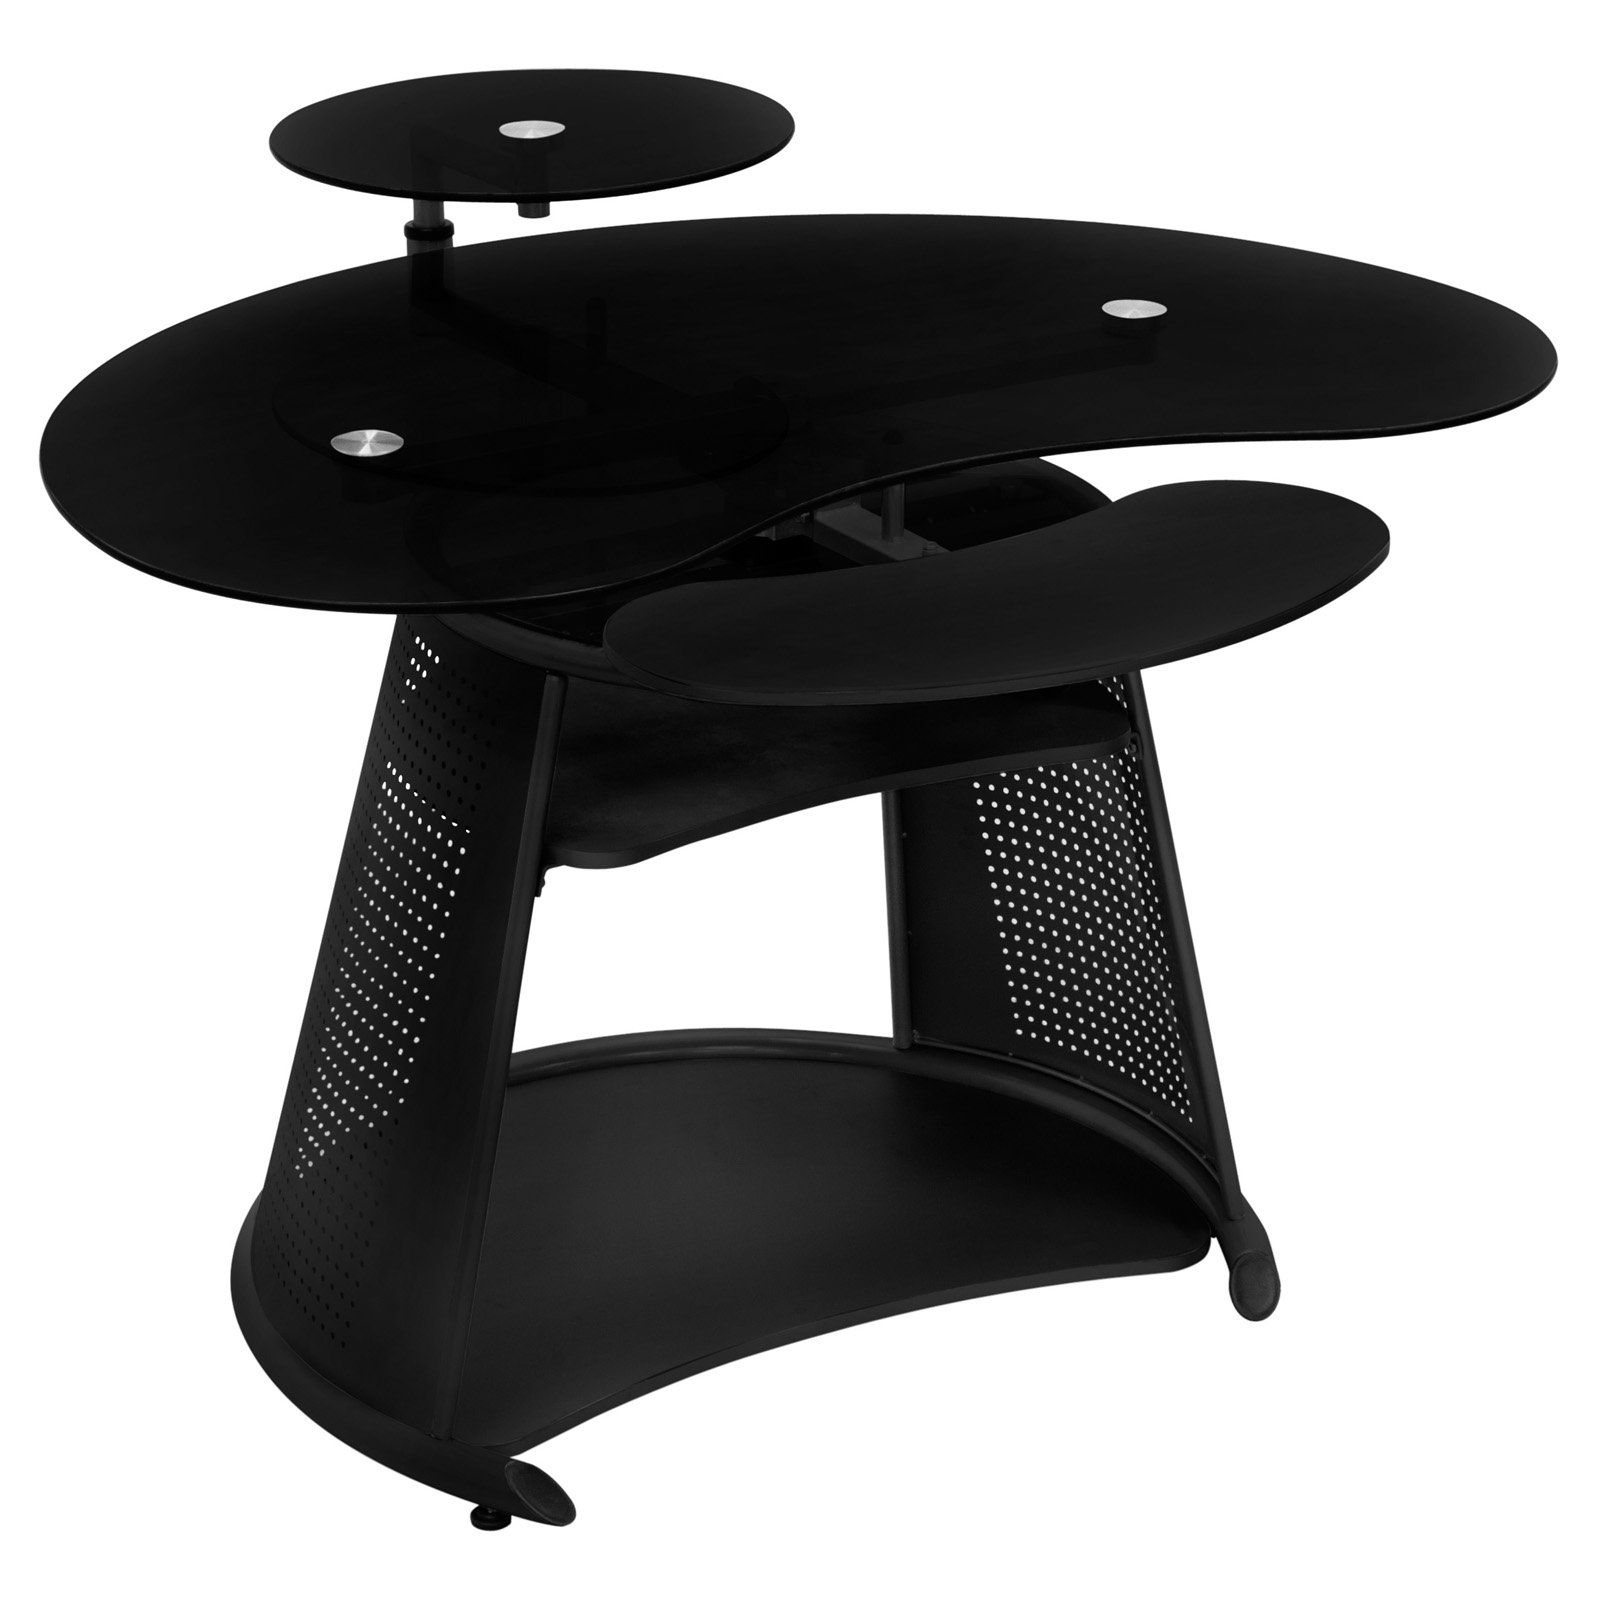 Studio Designs Neptune Computer Desk - 50351